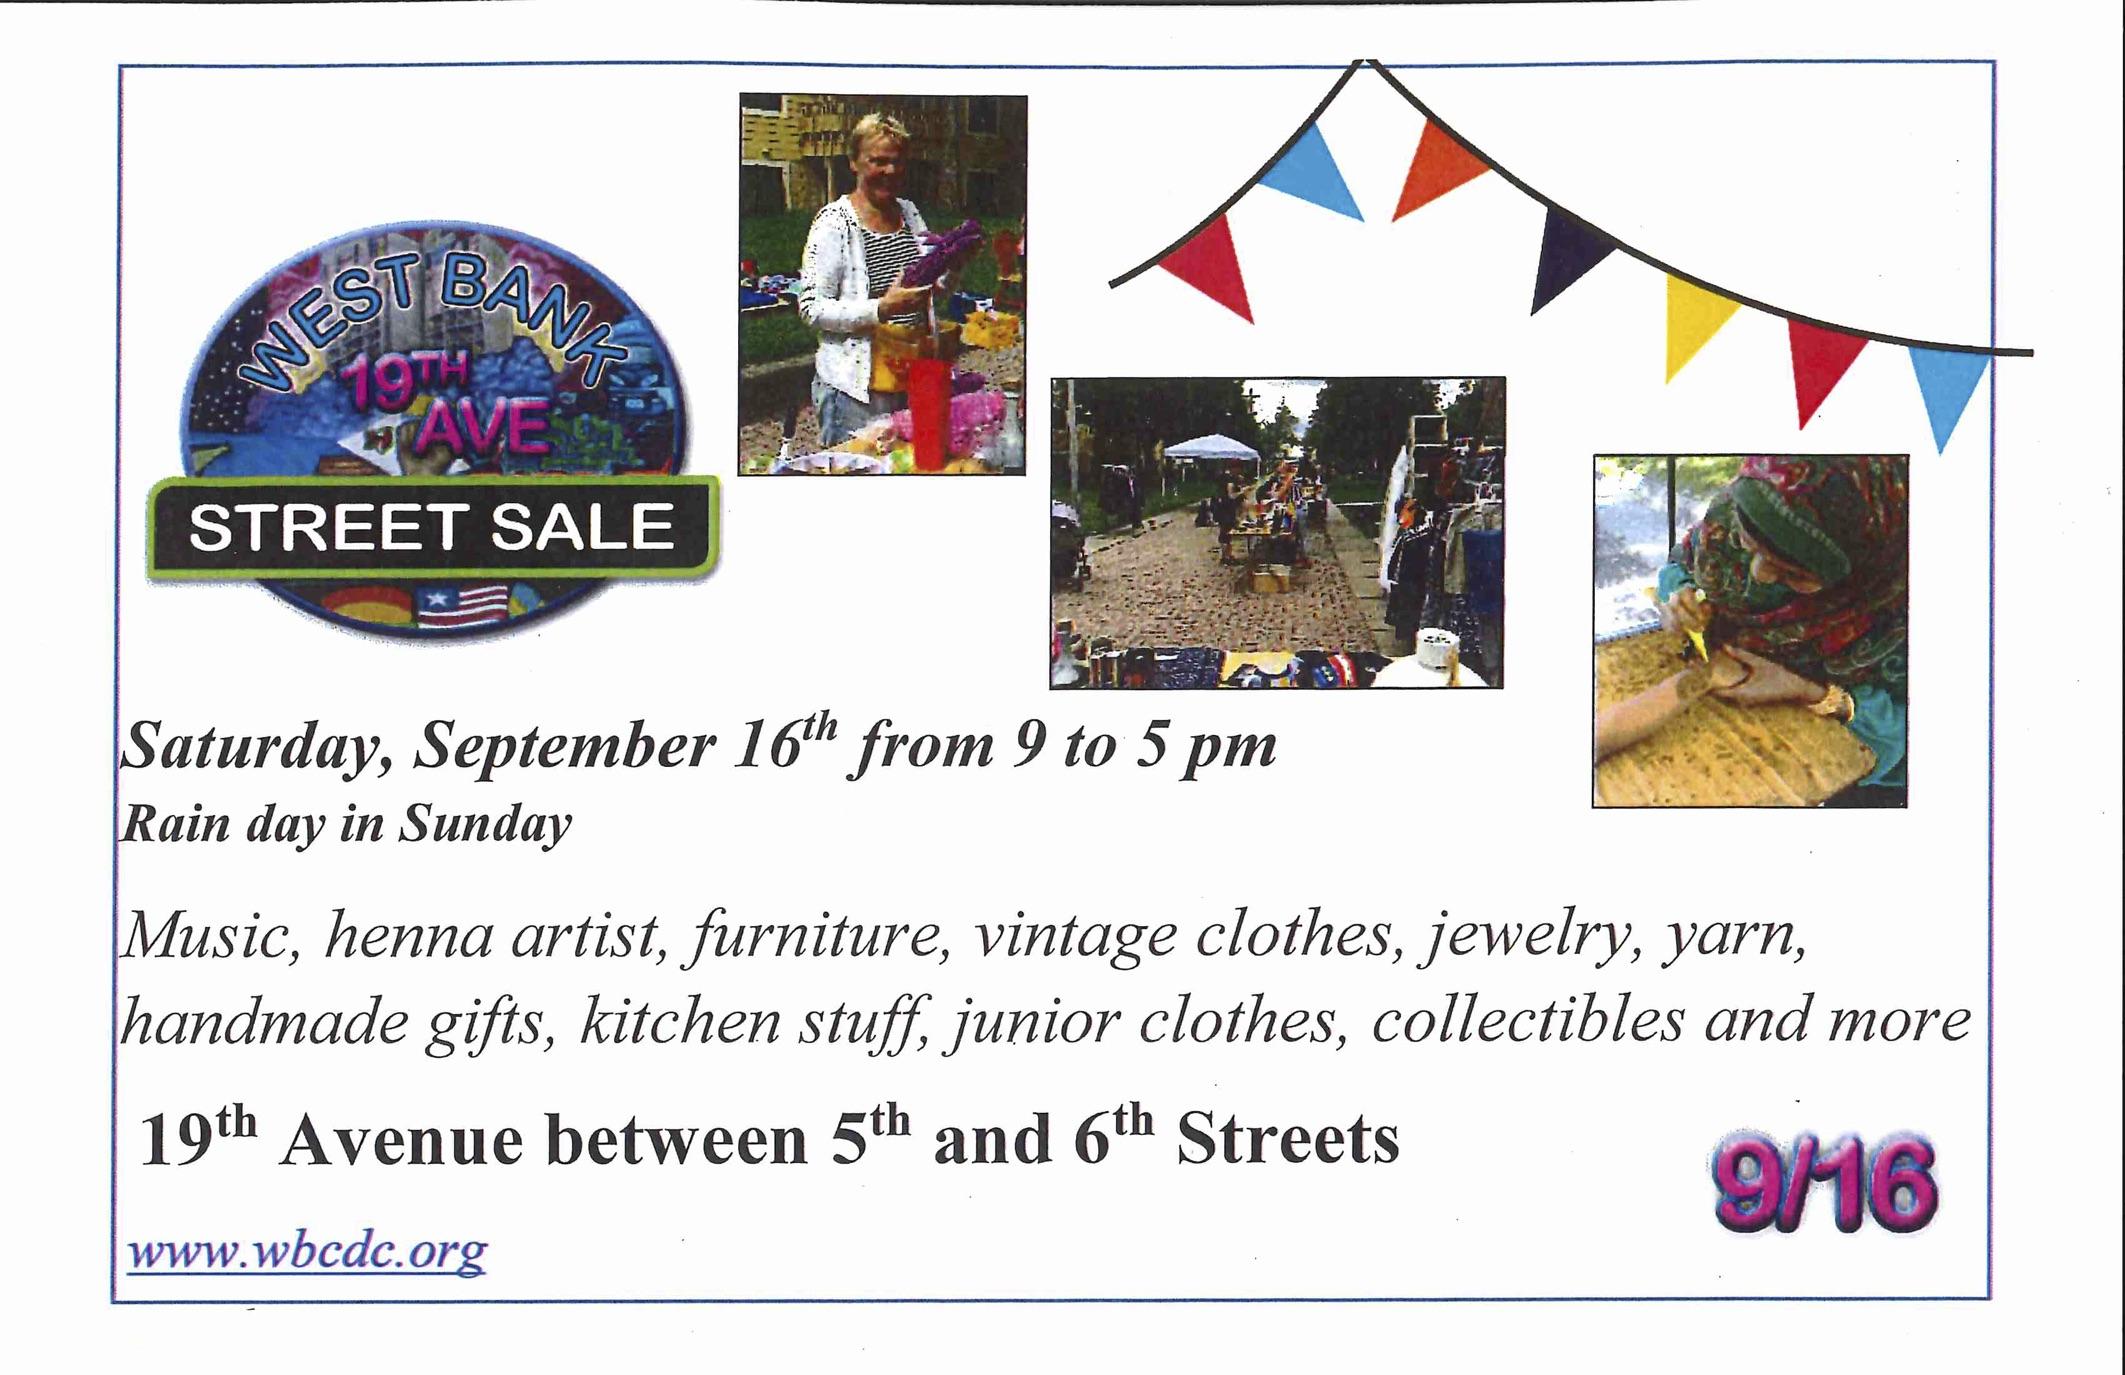 WBCDC_street_sale_flyer_091417.jpg